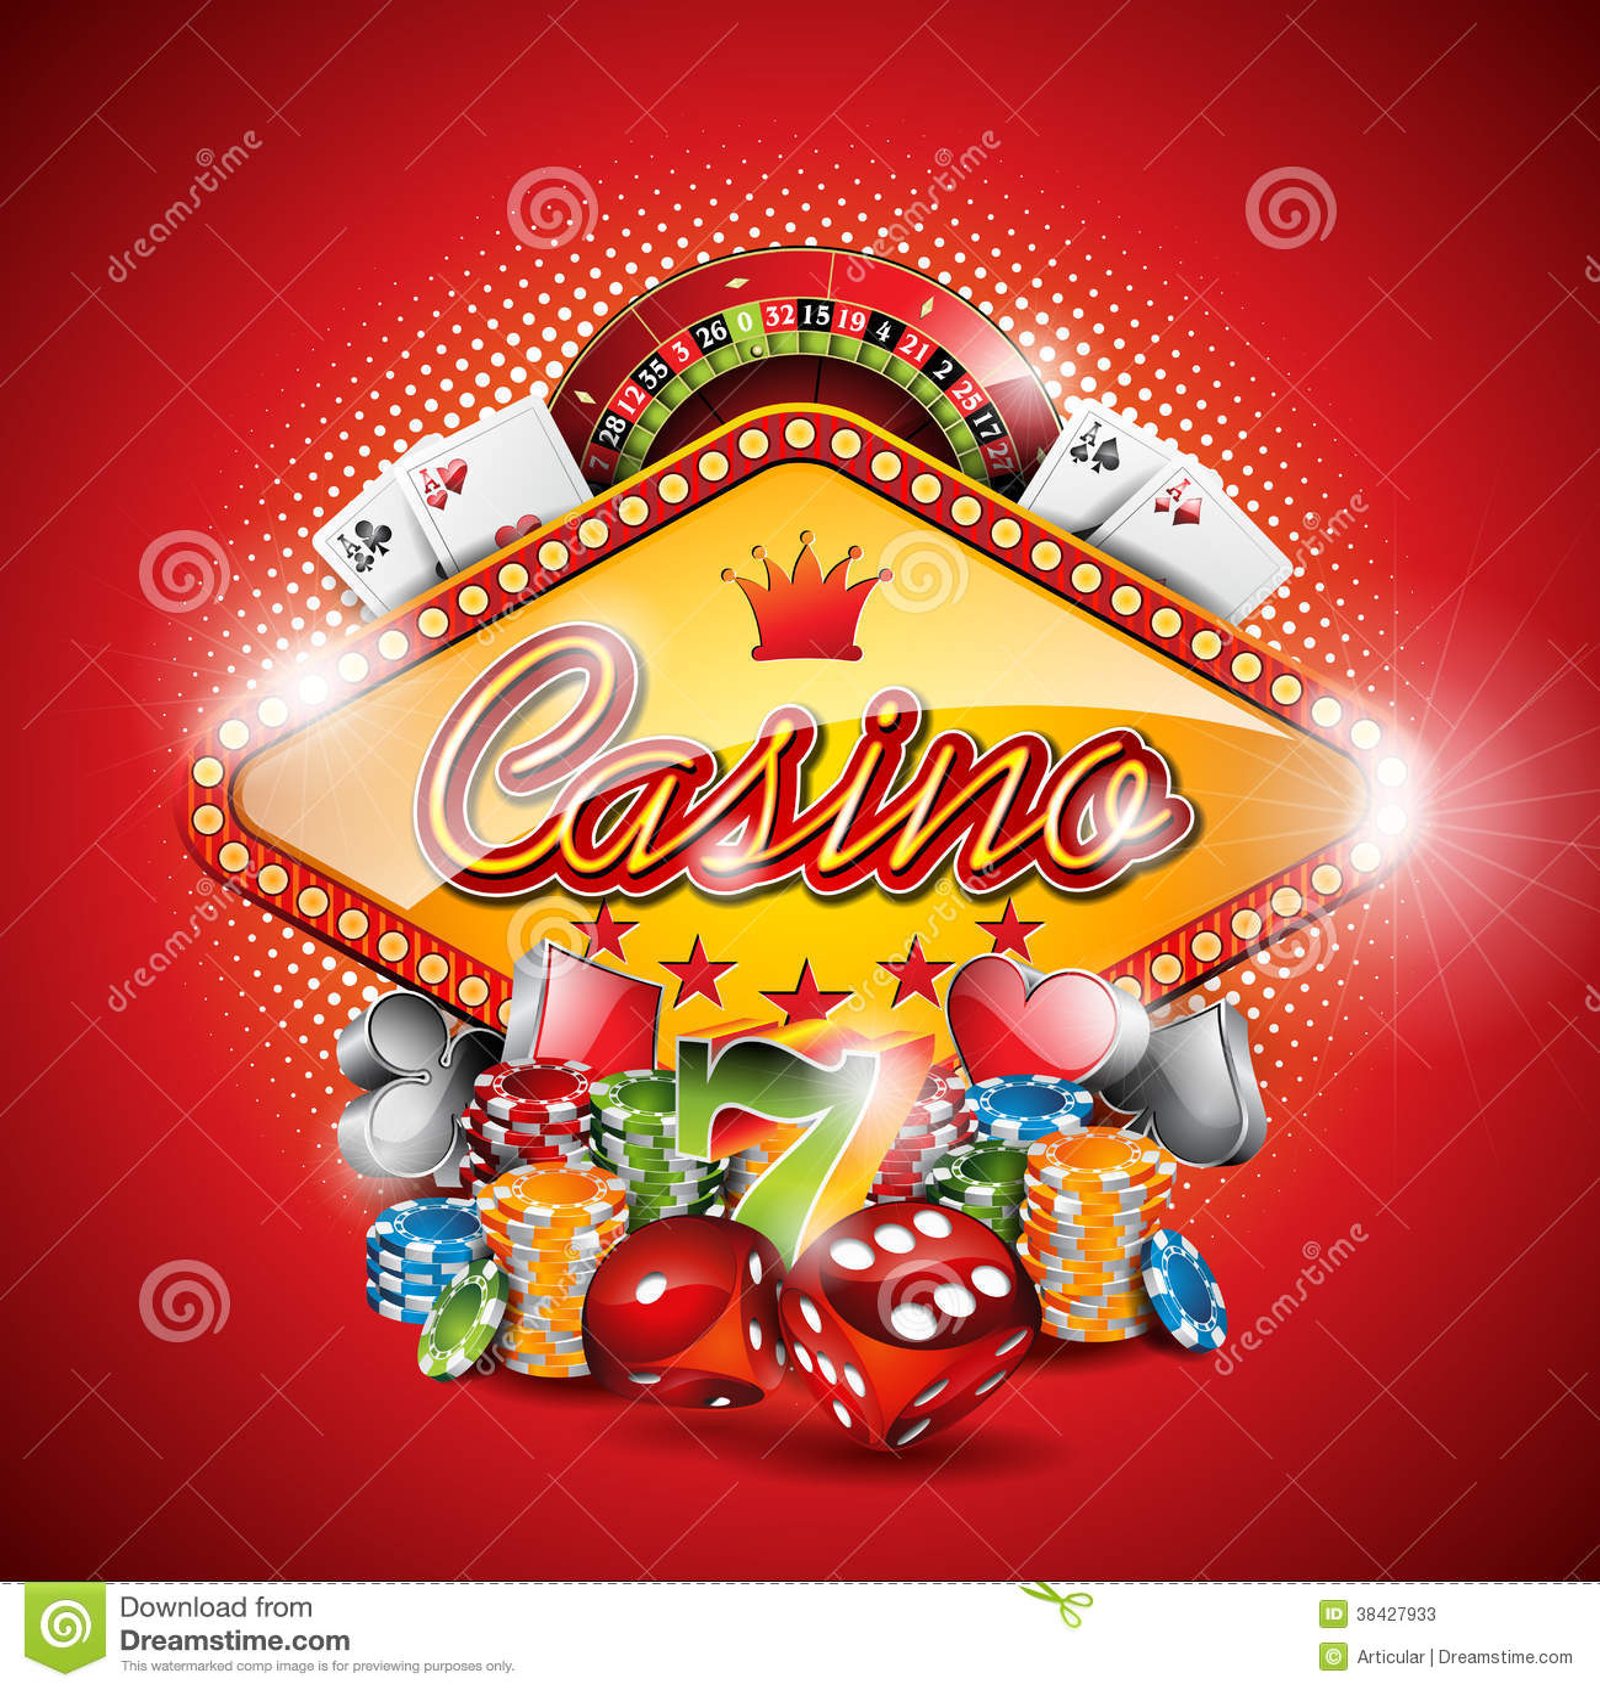 Poker wikipedia casino888 Coimbra online - 13242